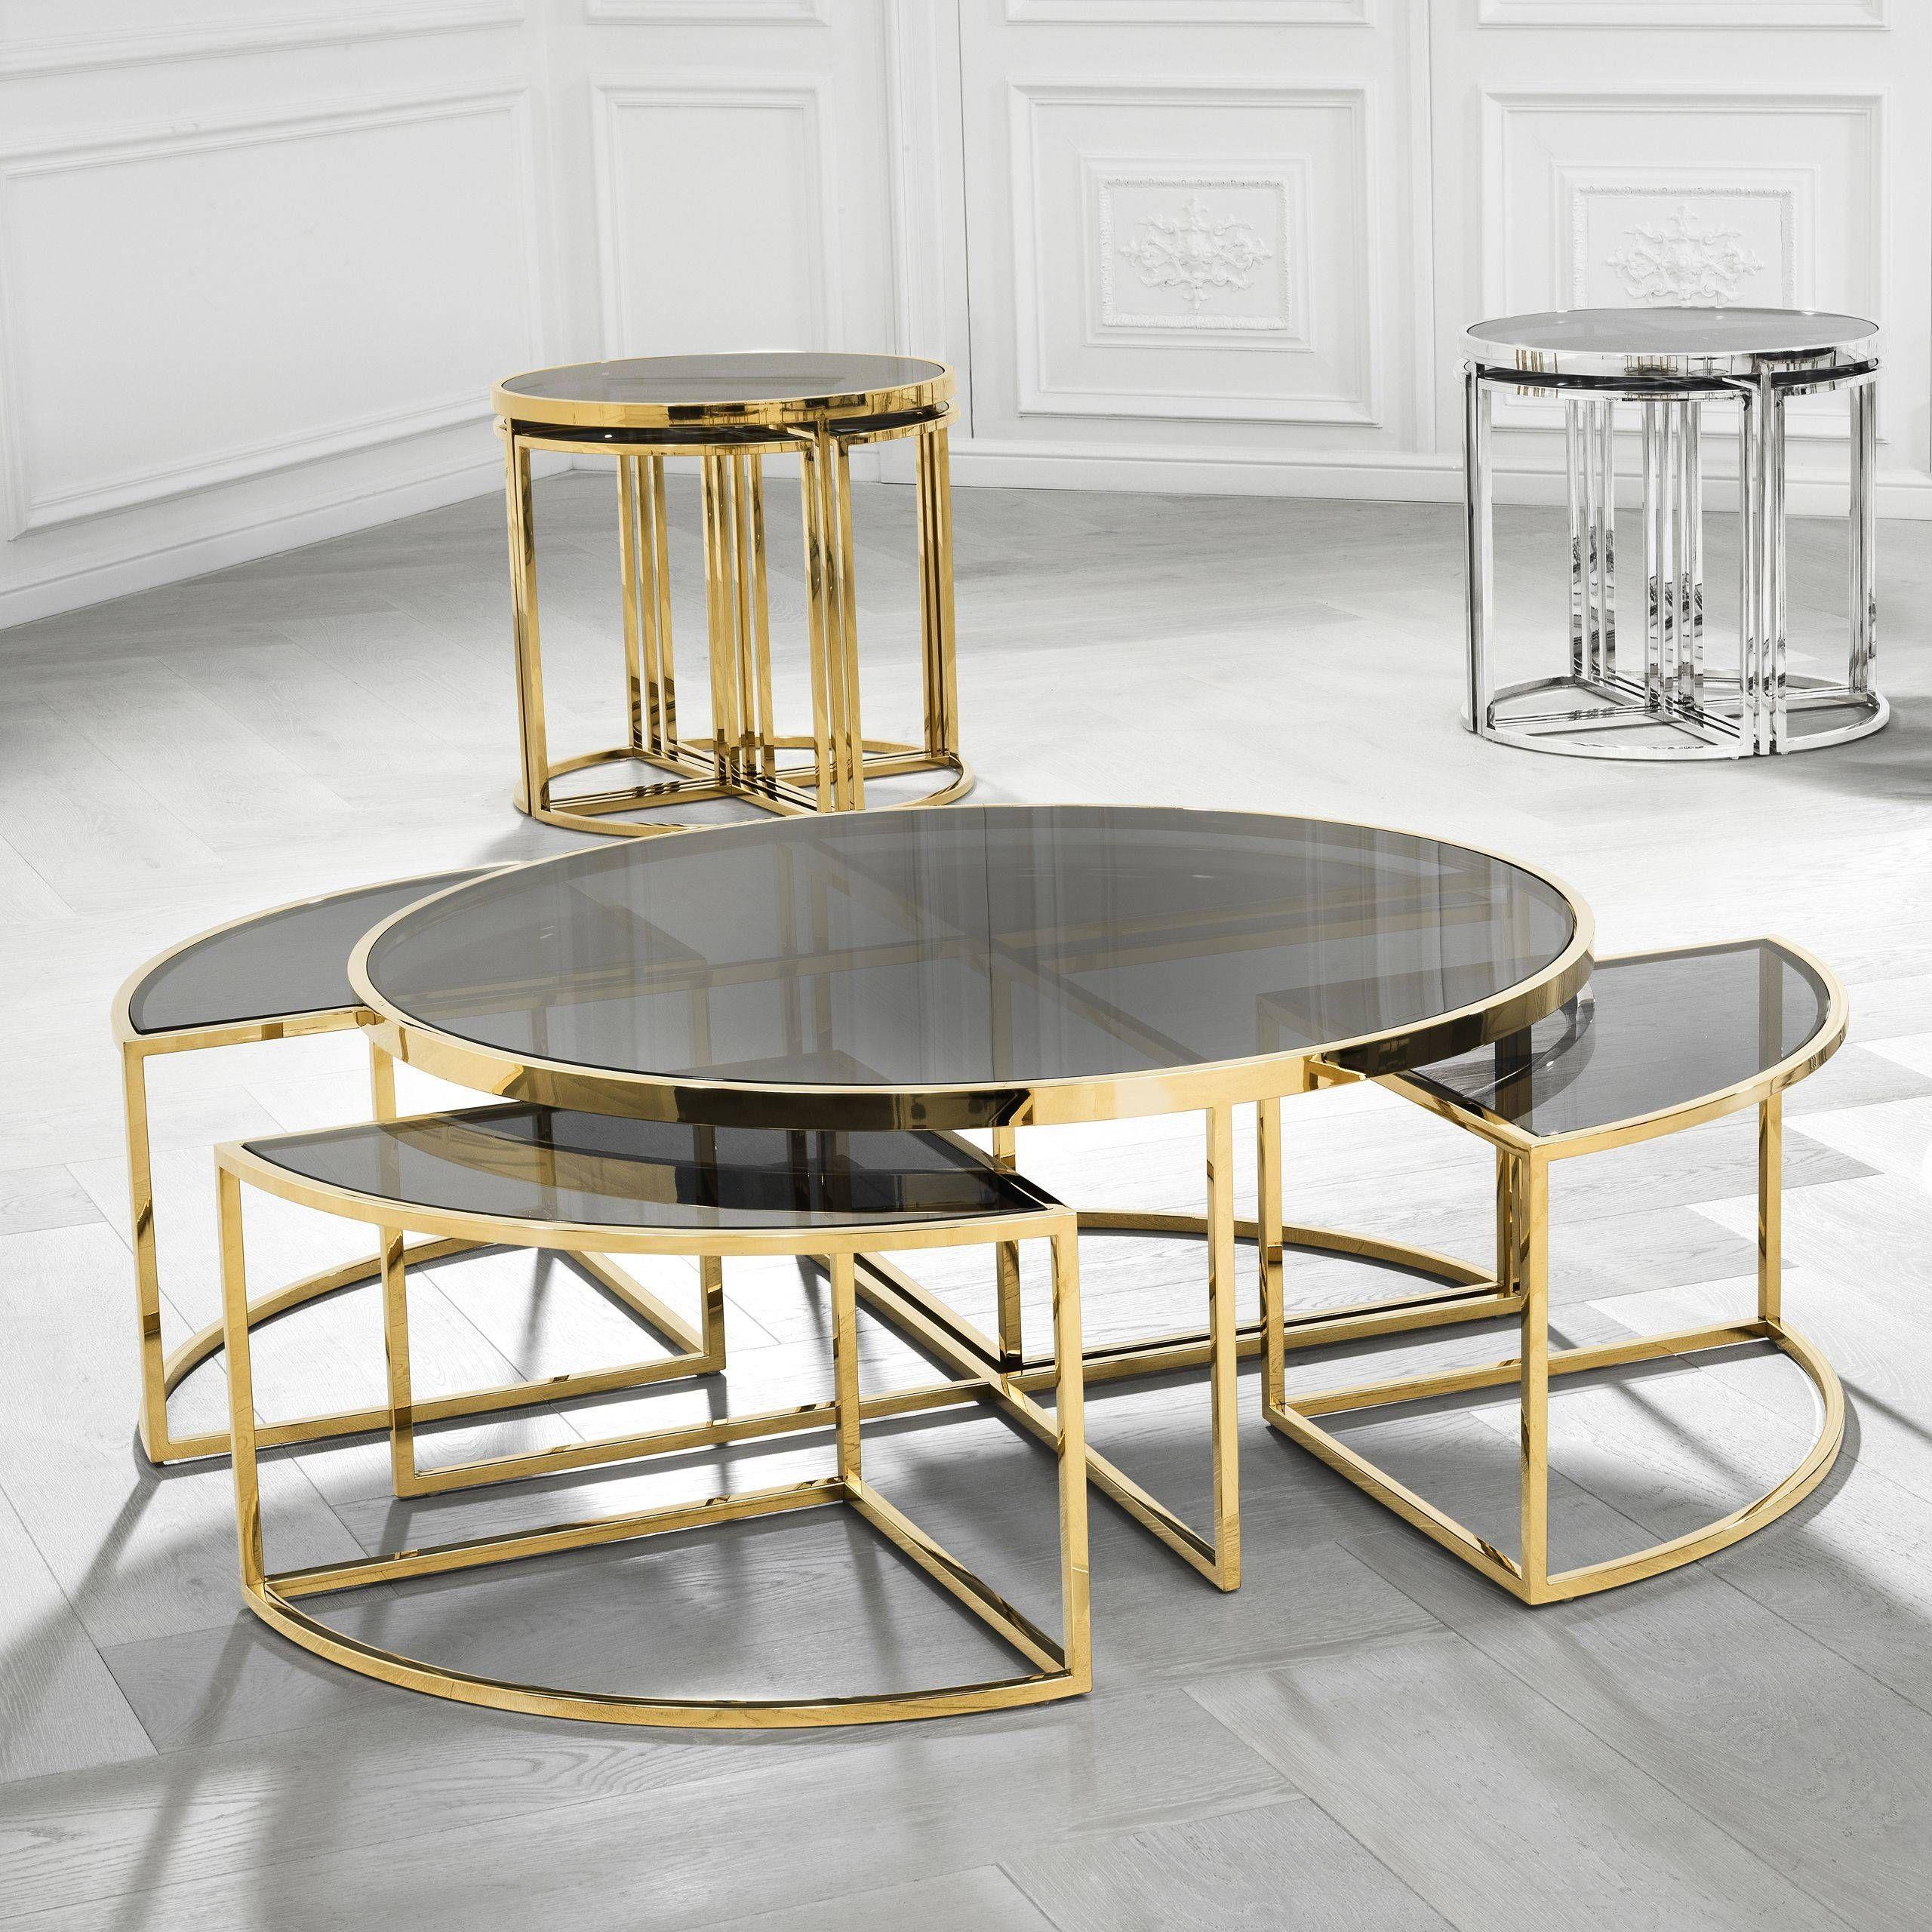 Nesting Coffee Table Eichholtz Padova In 2021 Nesting Coffee Tables Coffee Table Table [ 2560 x 2560 Pixel ]